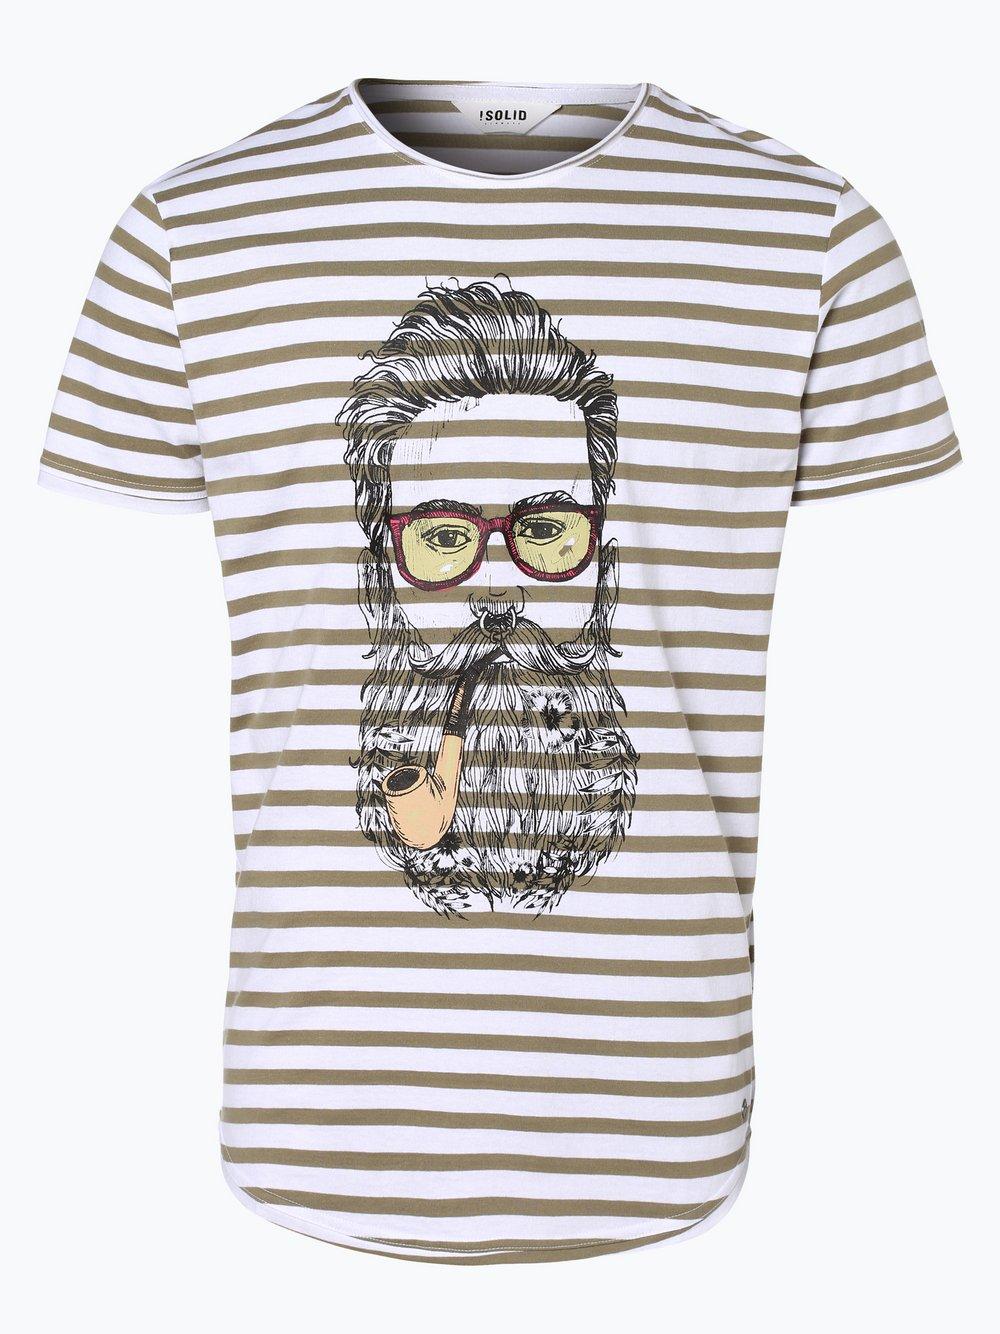 e9a250c318063f Solid Herren T-Shirt - Malik online kaufen